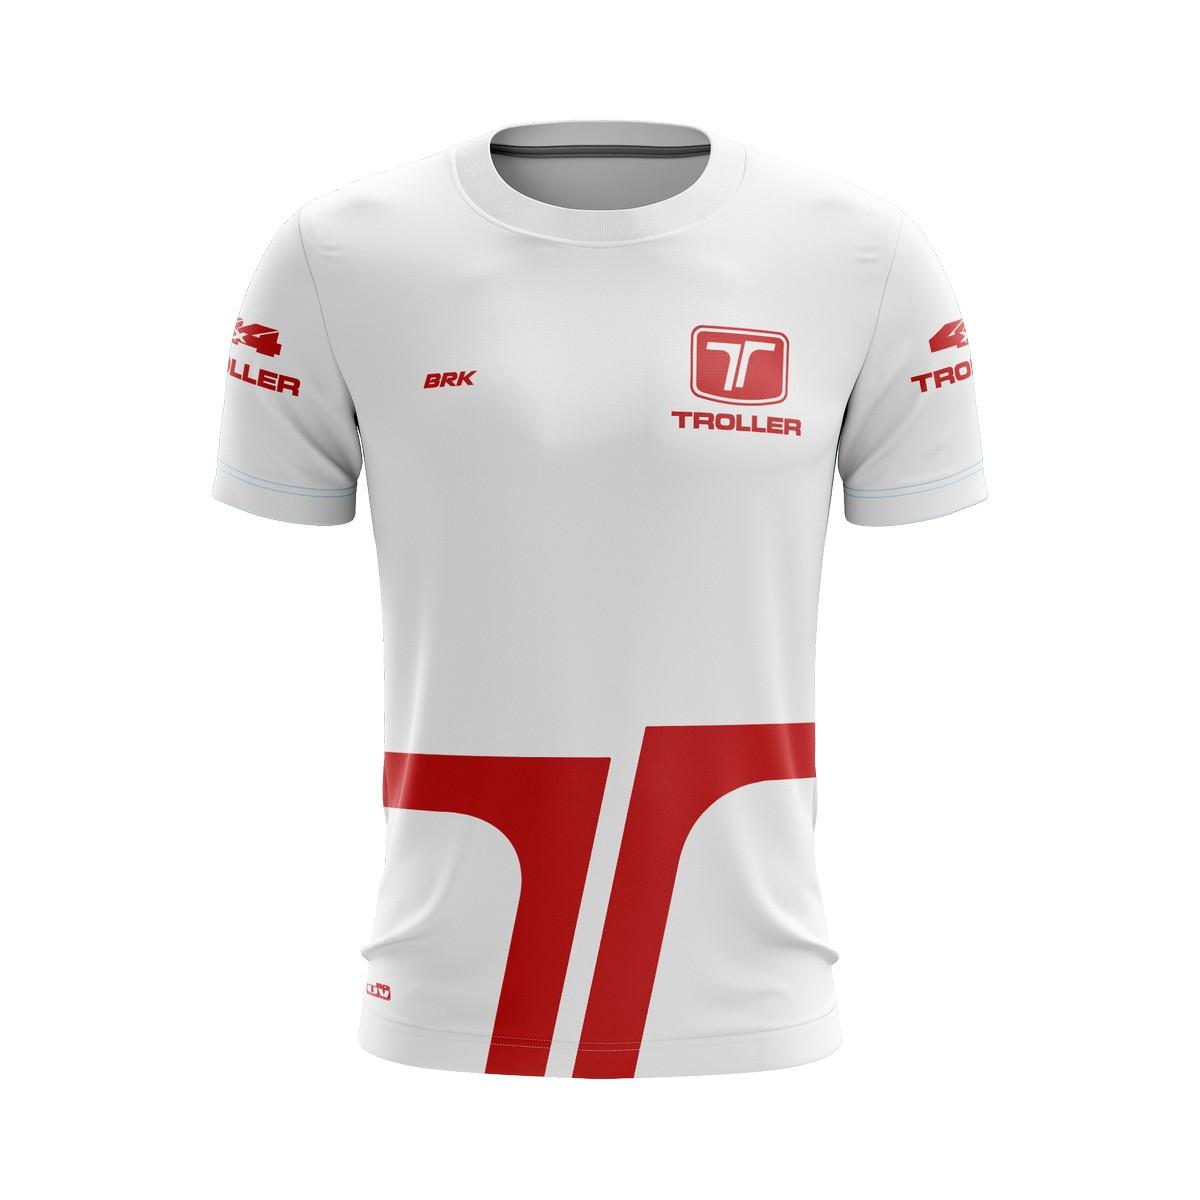 Camiseta Troller Casual 01 Brk Off Road Tecido Dry